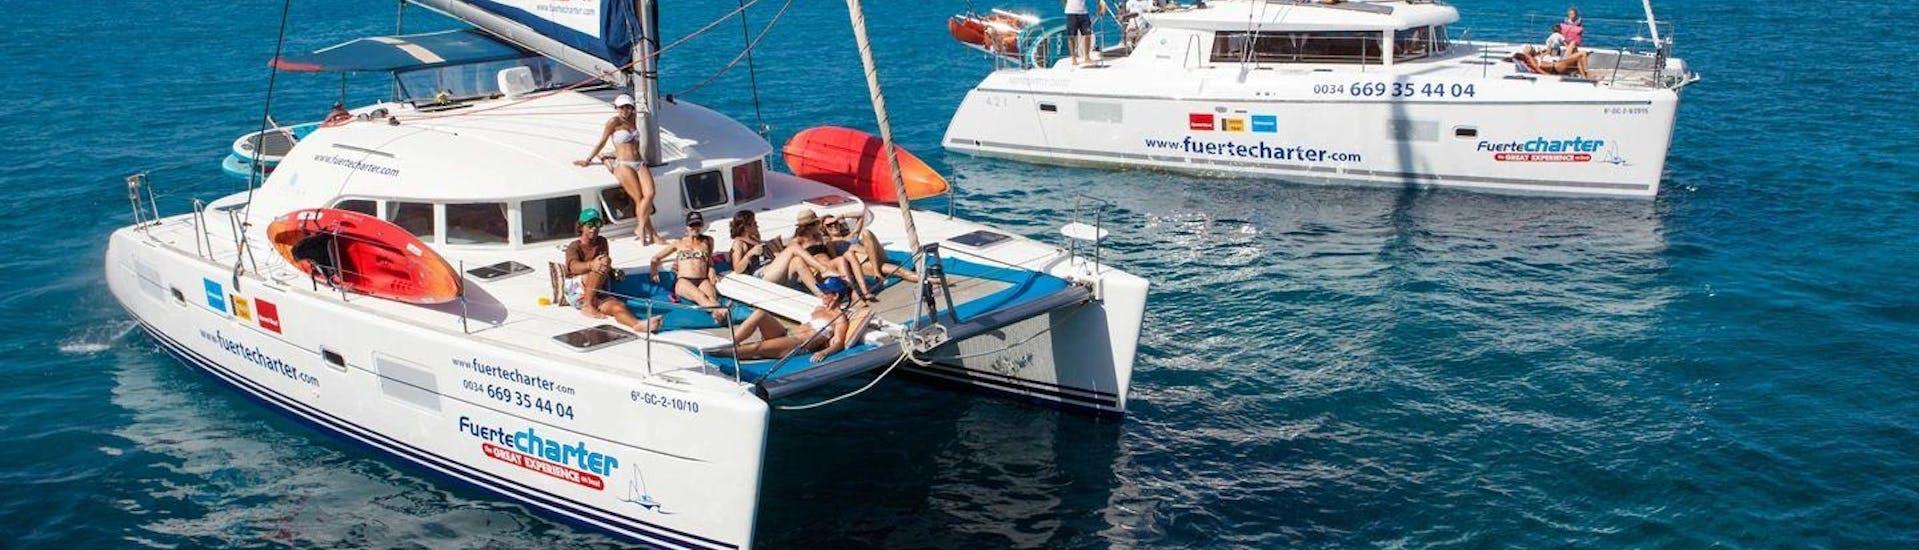 Balade privée en catamaran depuis Corralejo avec Kayak & SUP avec Fuerte Charter Corralejo - Hero image